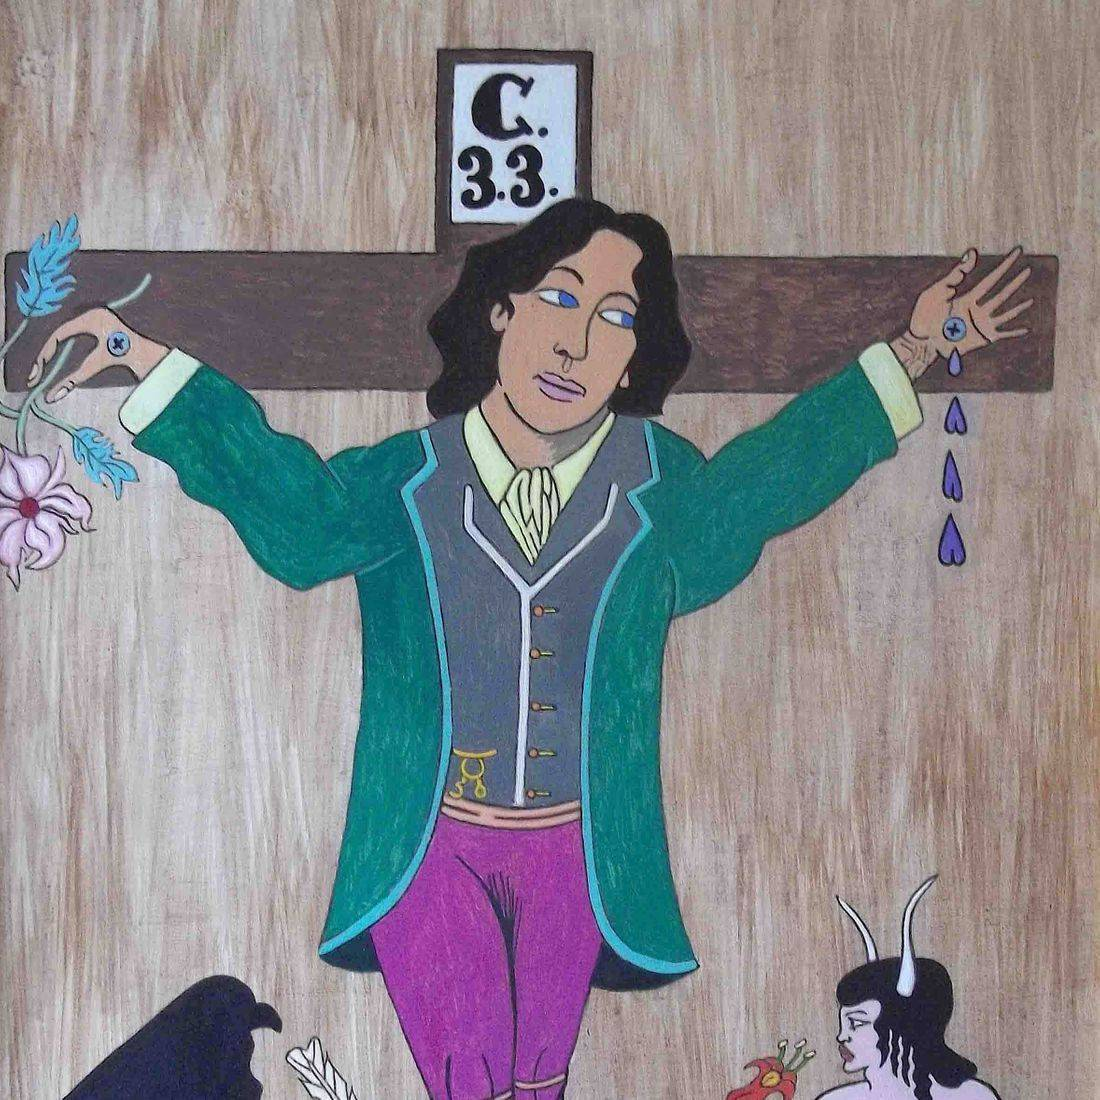 Oscar Wilde, Famous Writers, Homosexuality, Aubrey Beardsley, Prison, Dandy, Persecution, LGBT